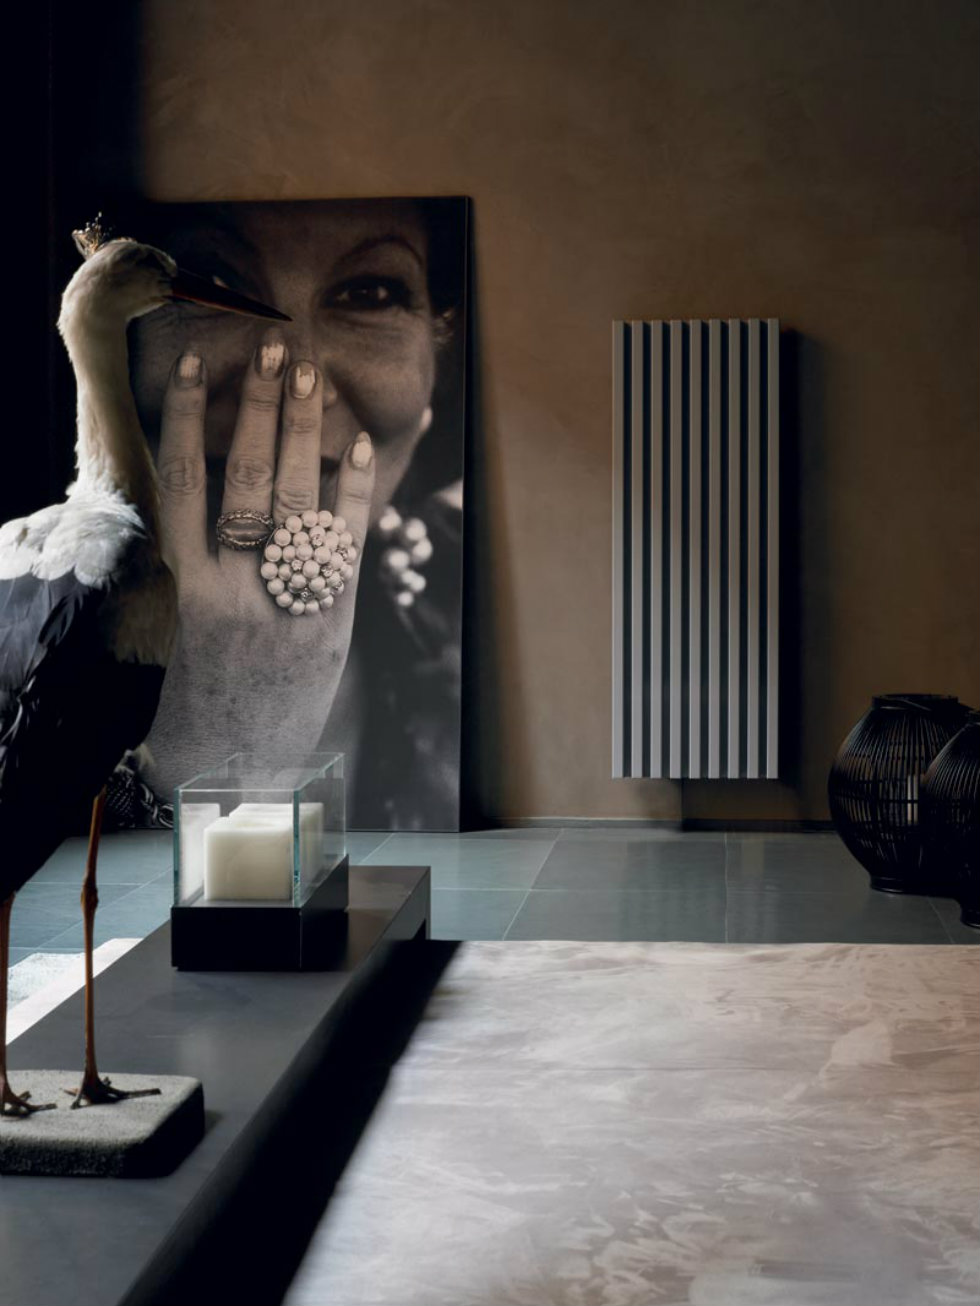 """Milan Design Agenda design tour into Palomba&Serafini interiors (5)"" Milan Design Agenda design tour into Palomba&Serafini interiors Milan Design Agenda design tour into Palomba&Serafini interiors Milan Design Agenda design tour into PalombaSerafini interiors 5"